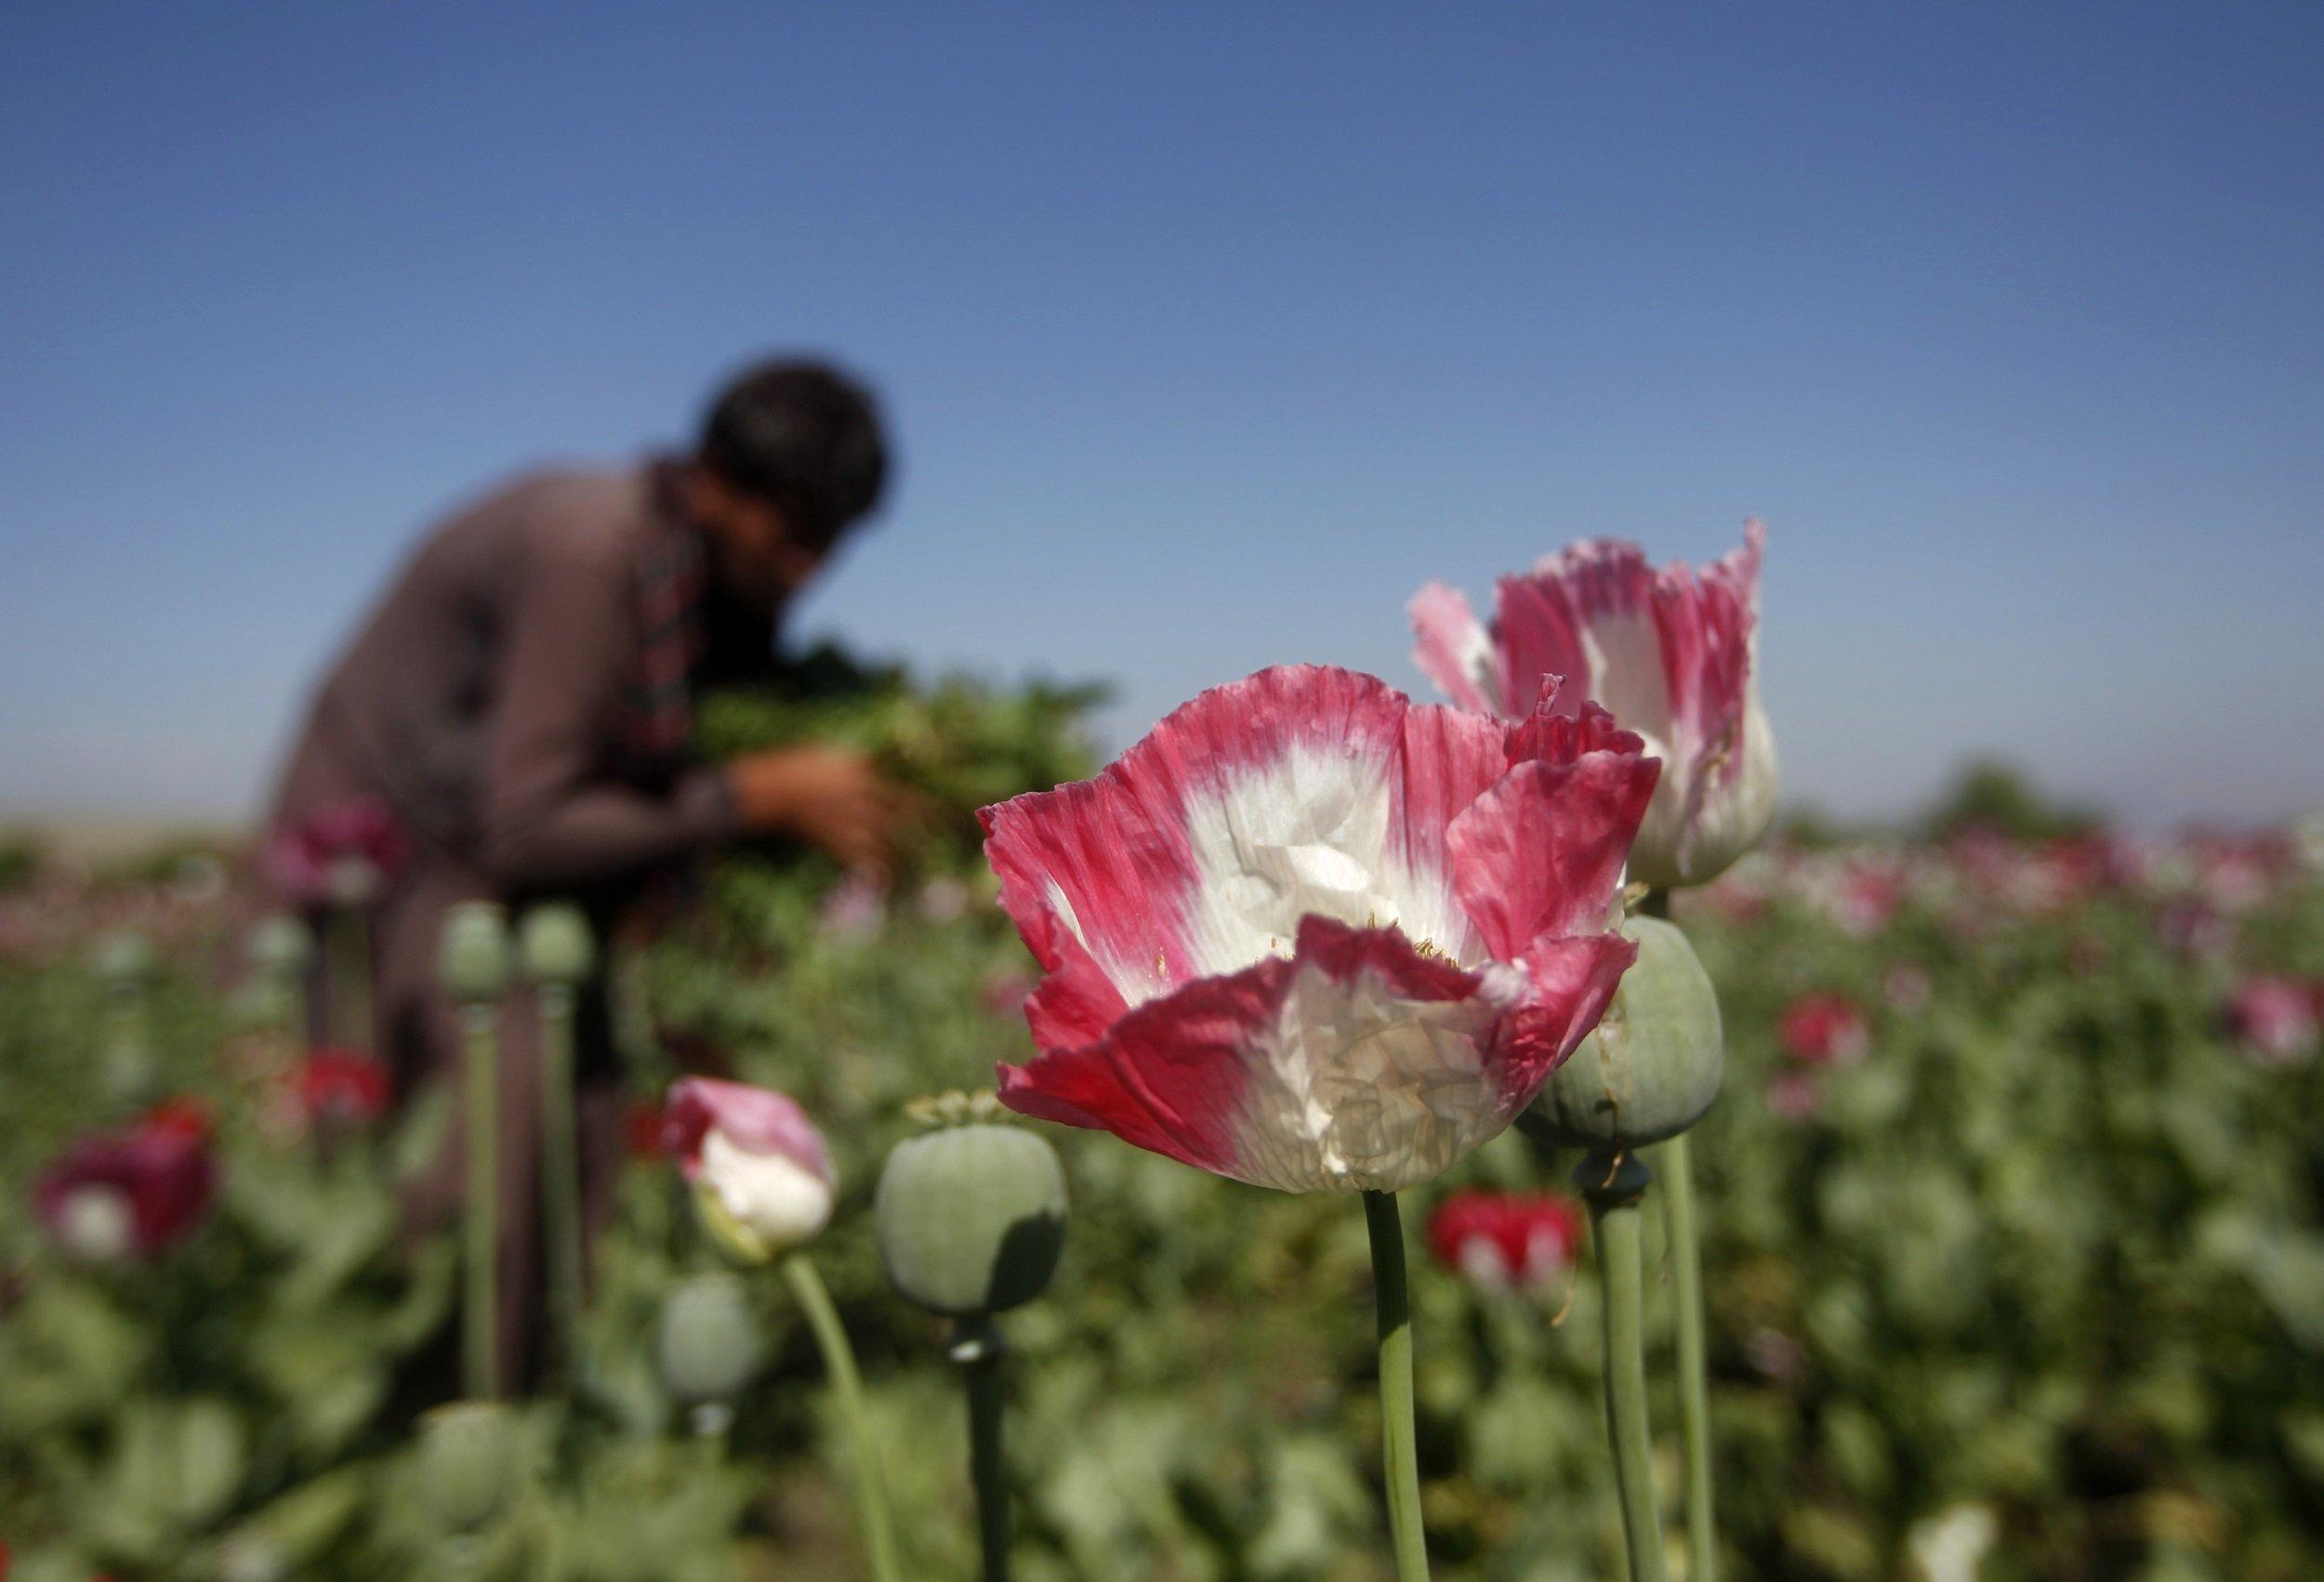 poppy opium